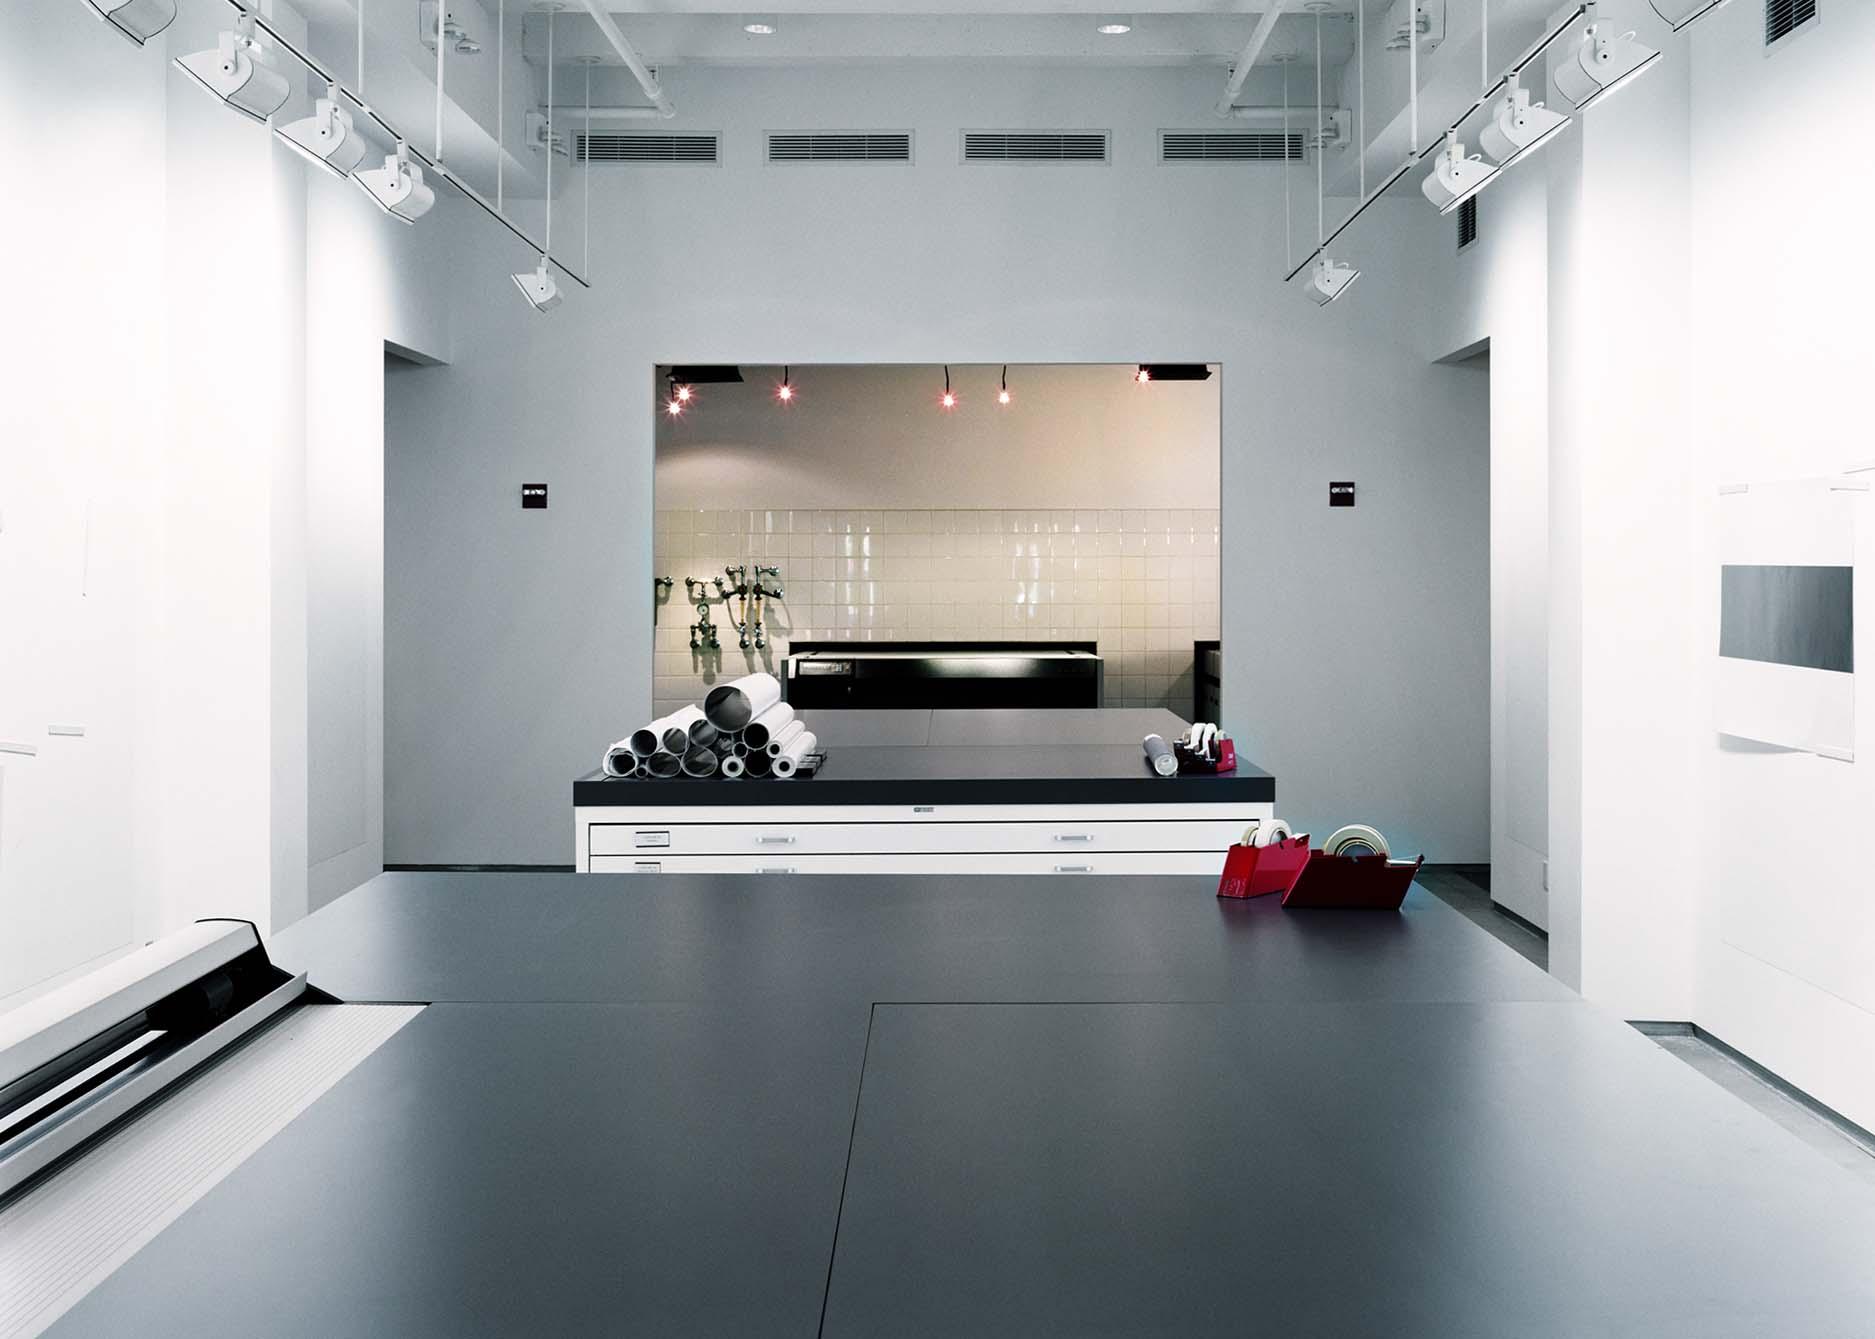 INTERNSHIP - exhibition department assistant, Box studio, New york, 2012